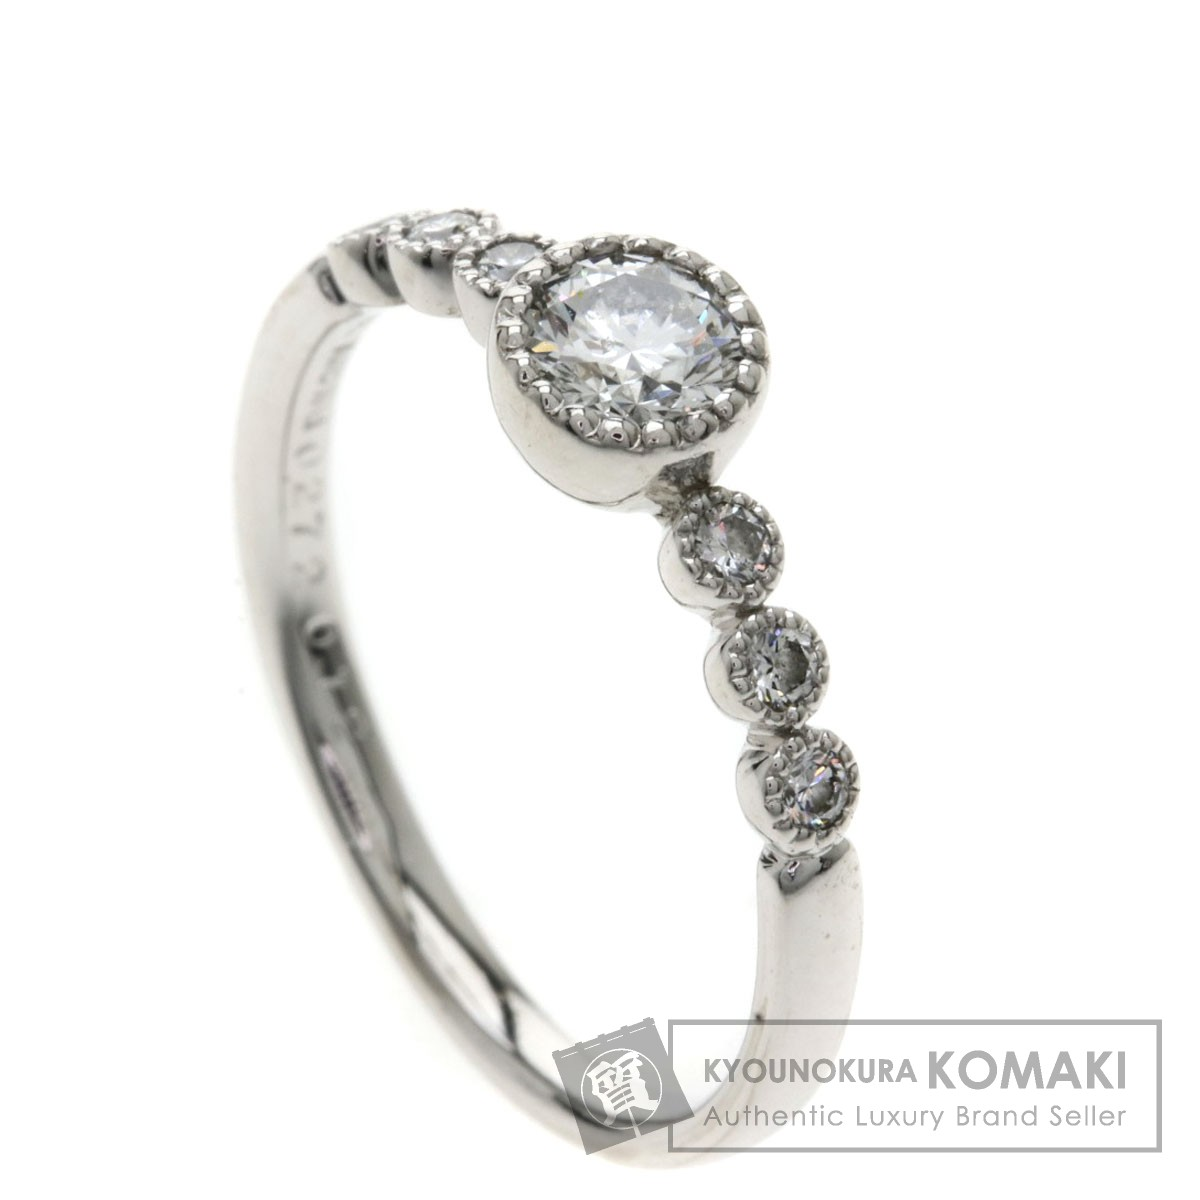 0.272ct ダイヤモンド リング・指輪 K18ホワイトゴールド 2.2g レディース 【中古】